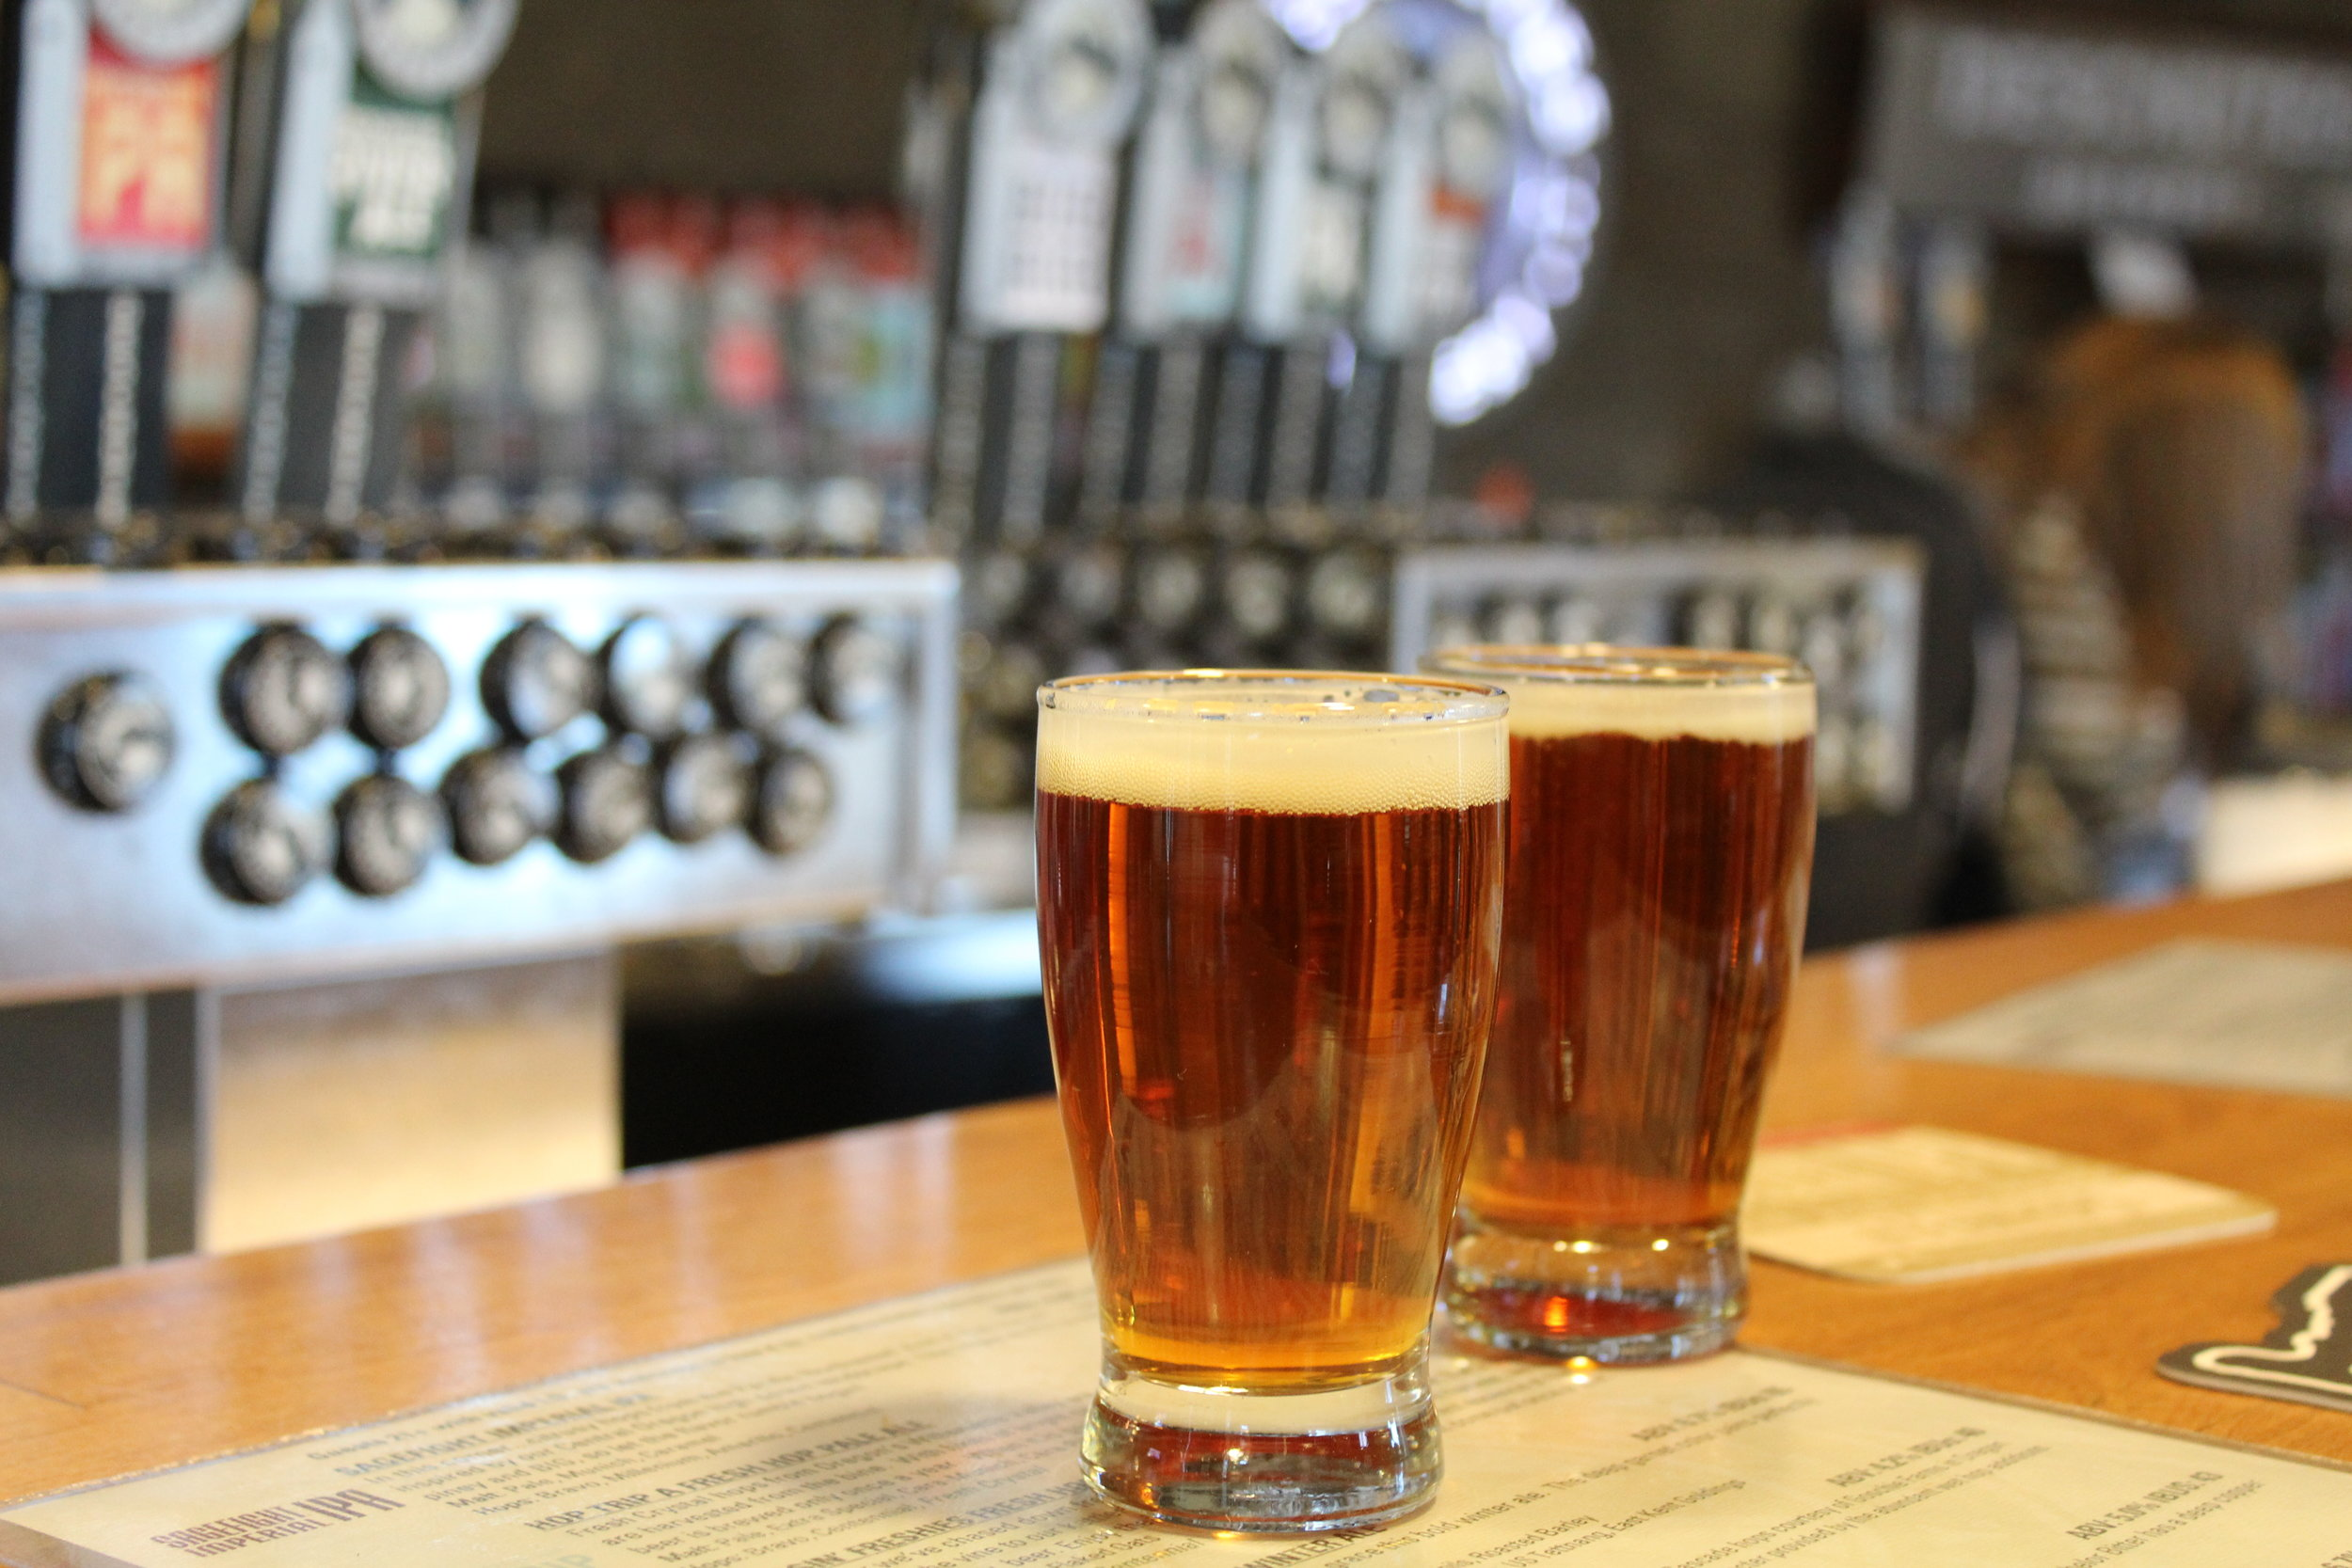 Deschtues Brewery Tasting Room